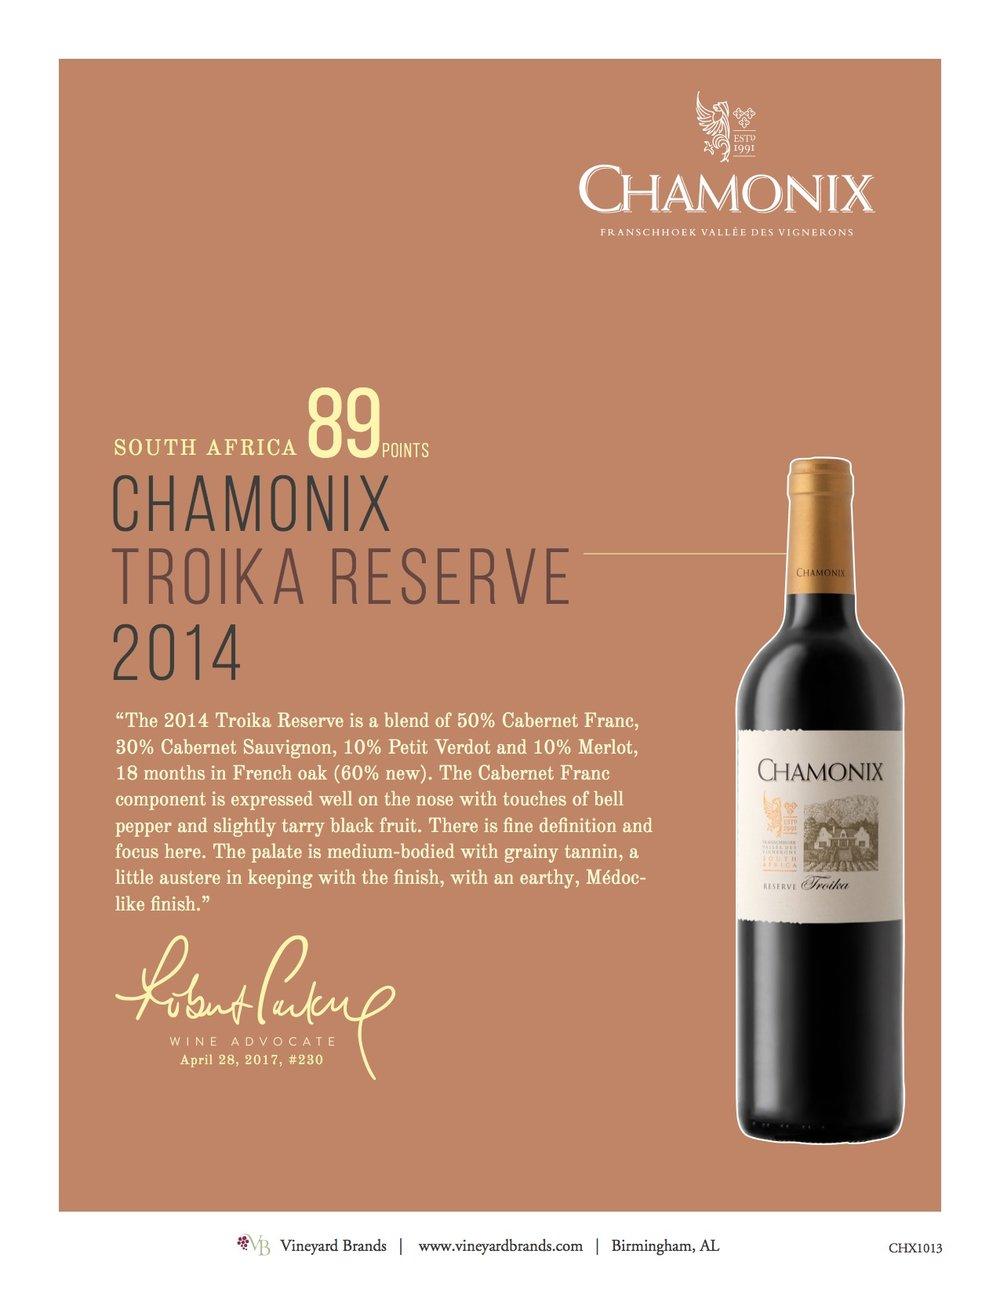 Chamonix 2014 Troika Reserve.jpg